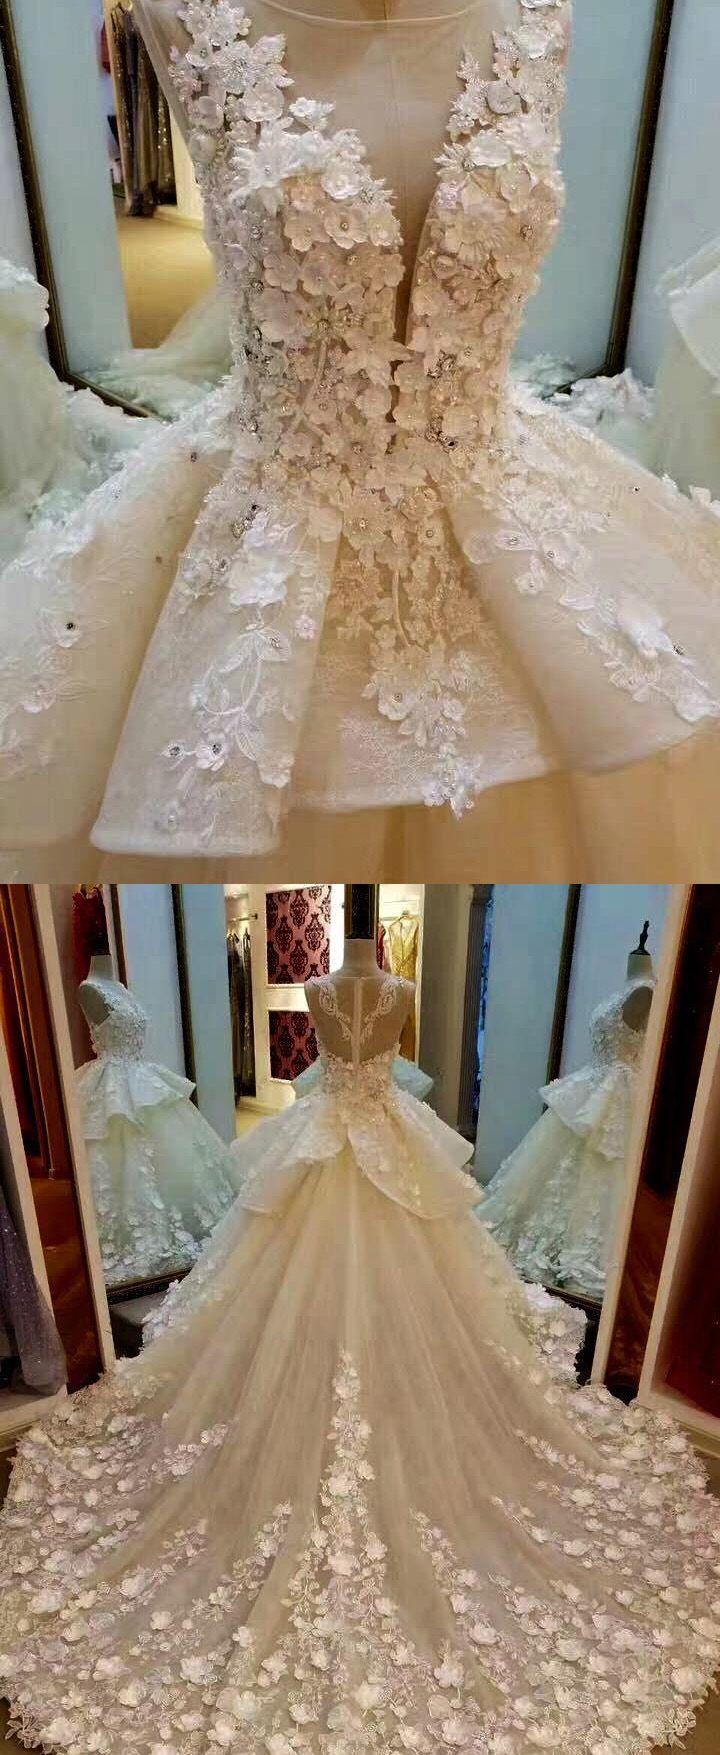 Long train wedding dresses white wedding dresses bridal wedding